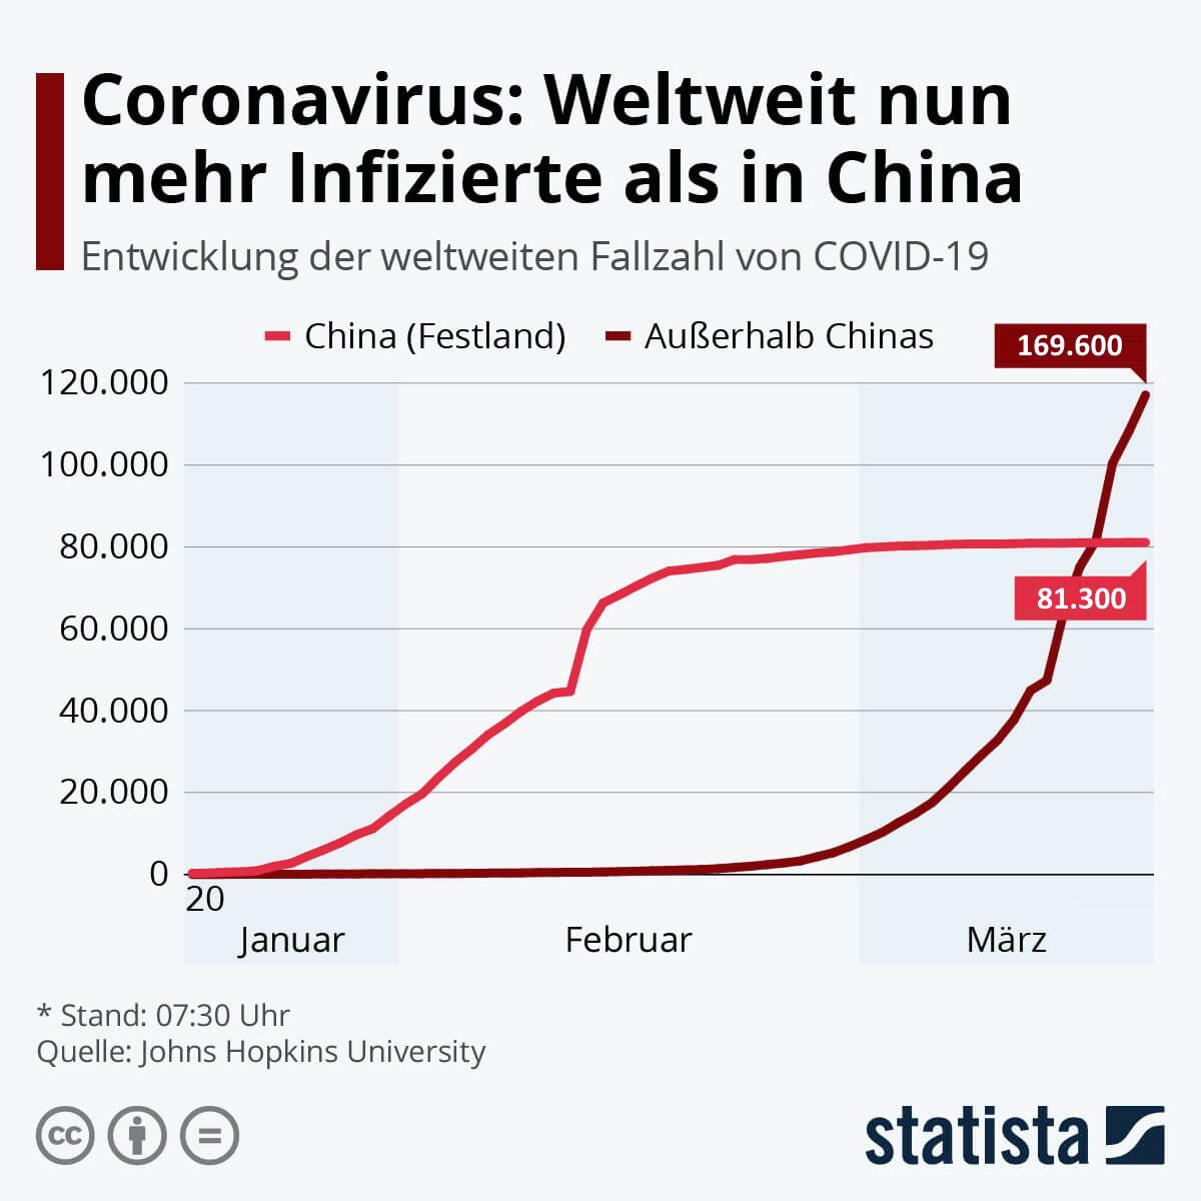 Corona China Infizierte